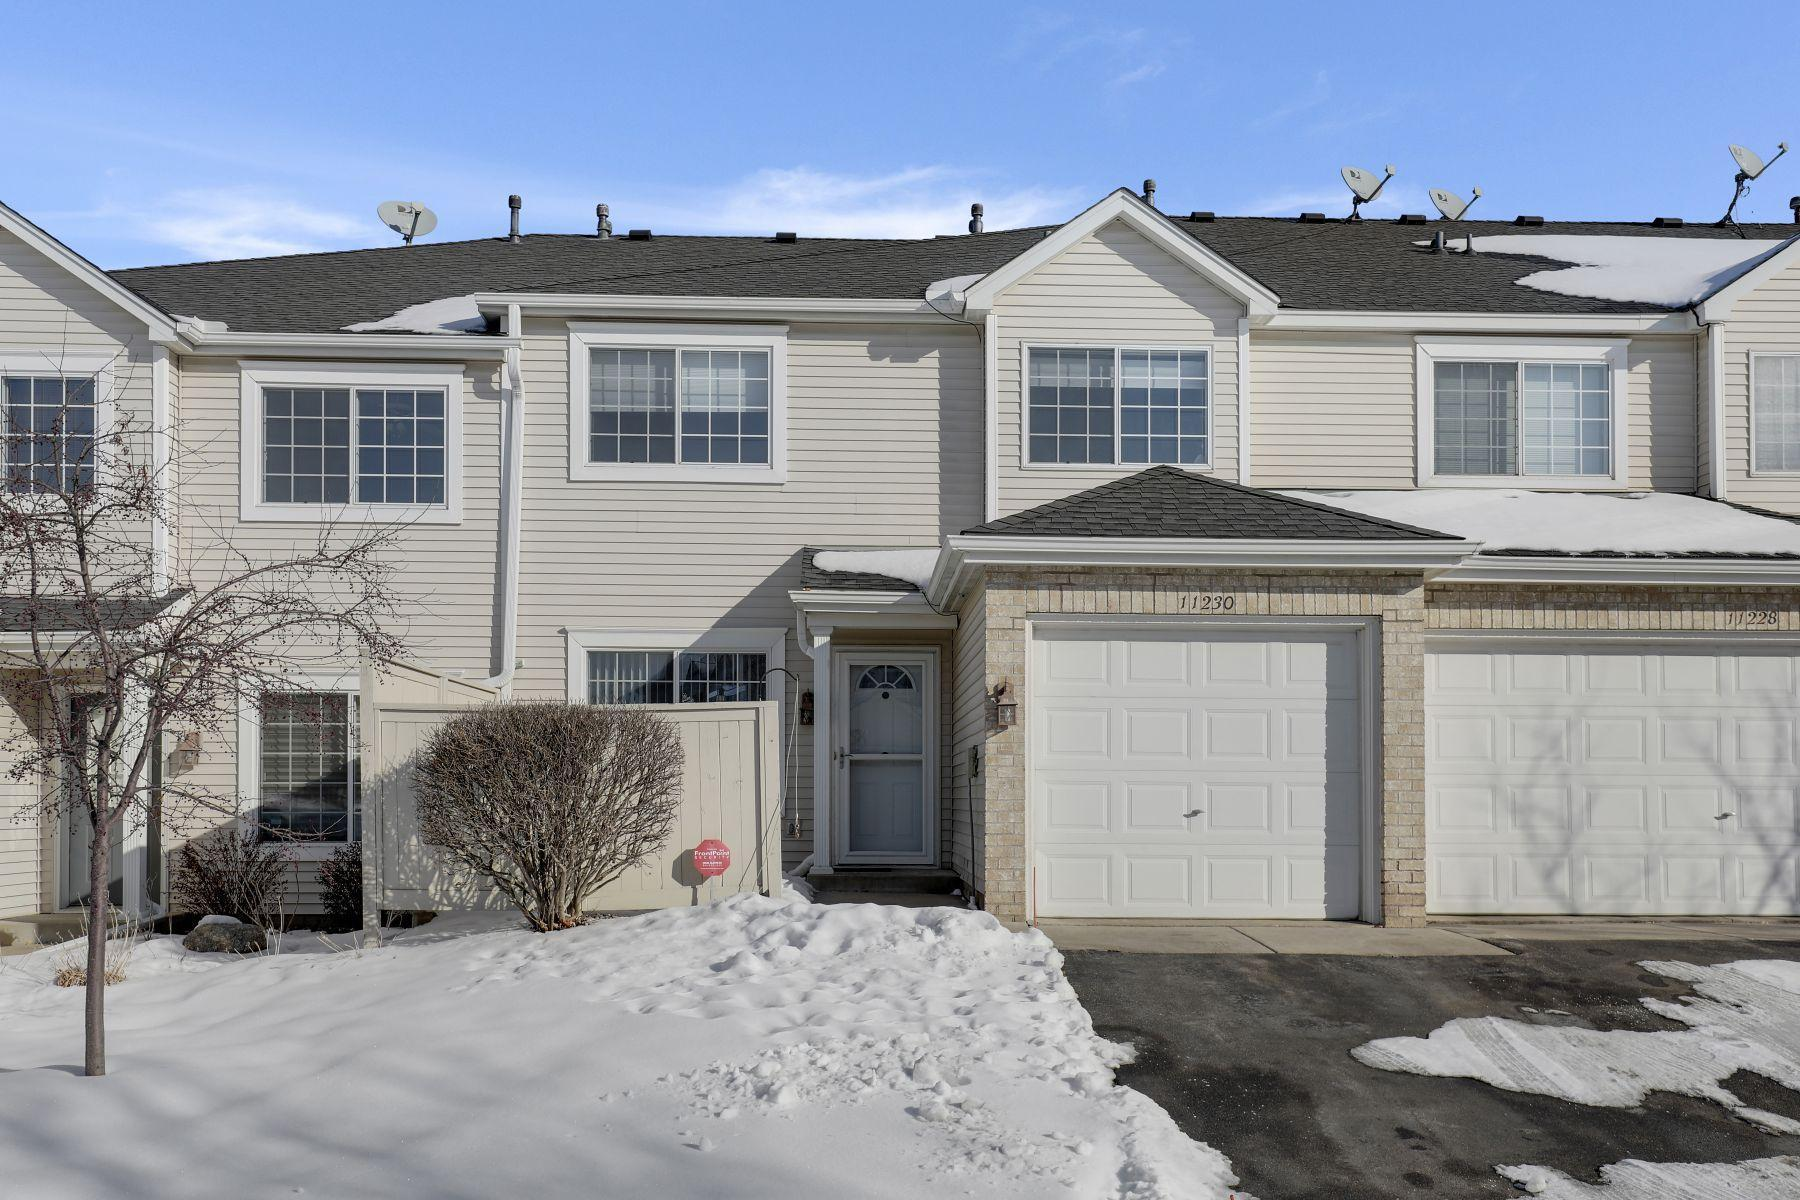 11230 Providence Lane Property Photo - Eden Prairie, MN real estate listing